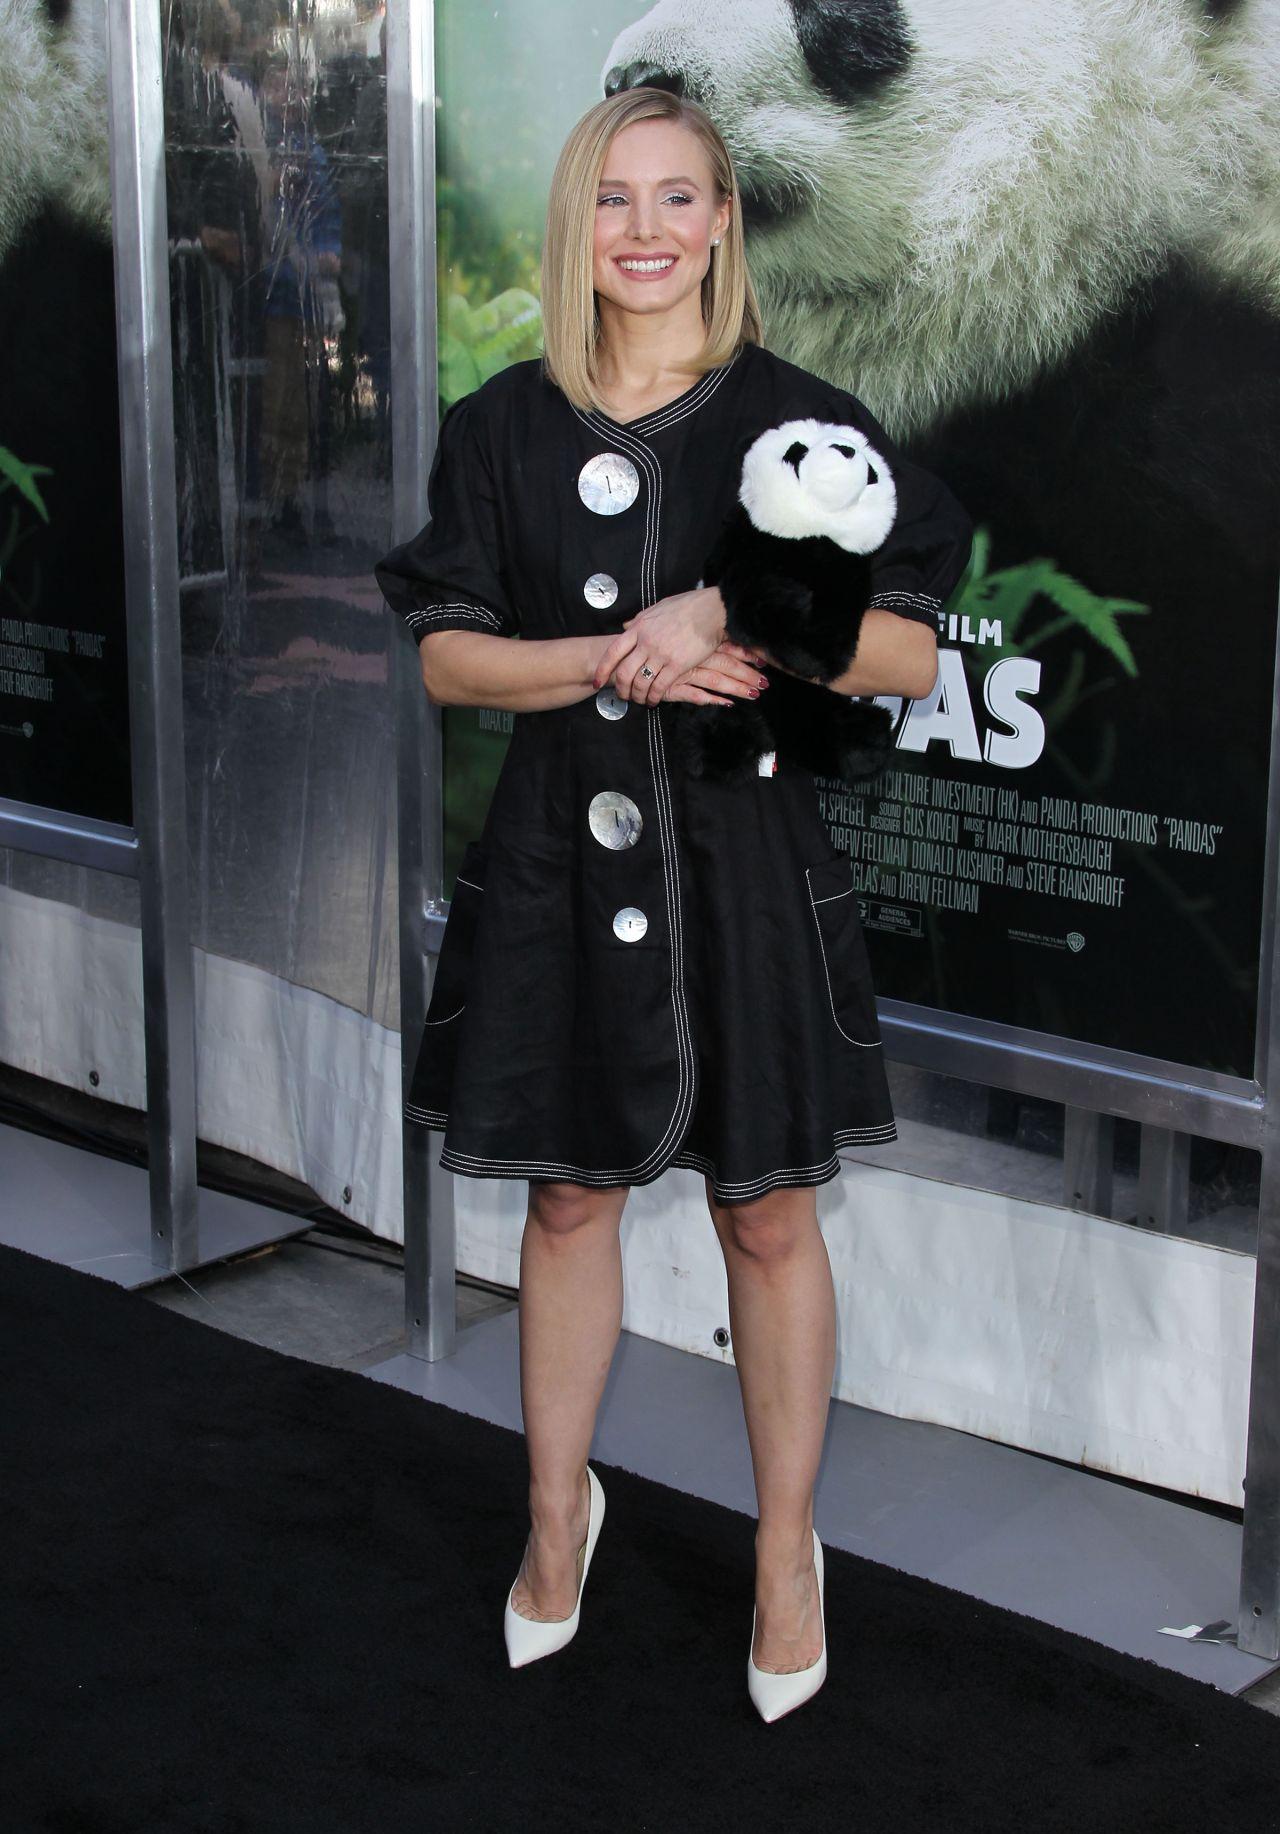 http://celebmafia.com/wp-content/uploads/2018/03/kristen-bell-pandas-premiere-in-hollywood-7.jpg